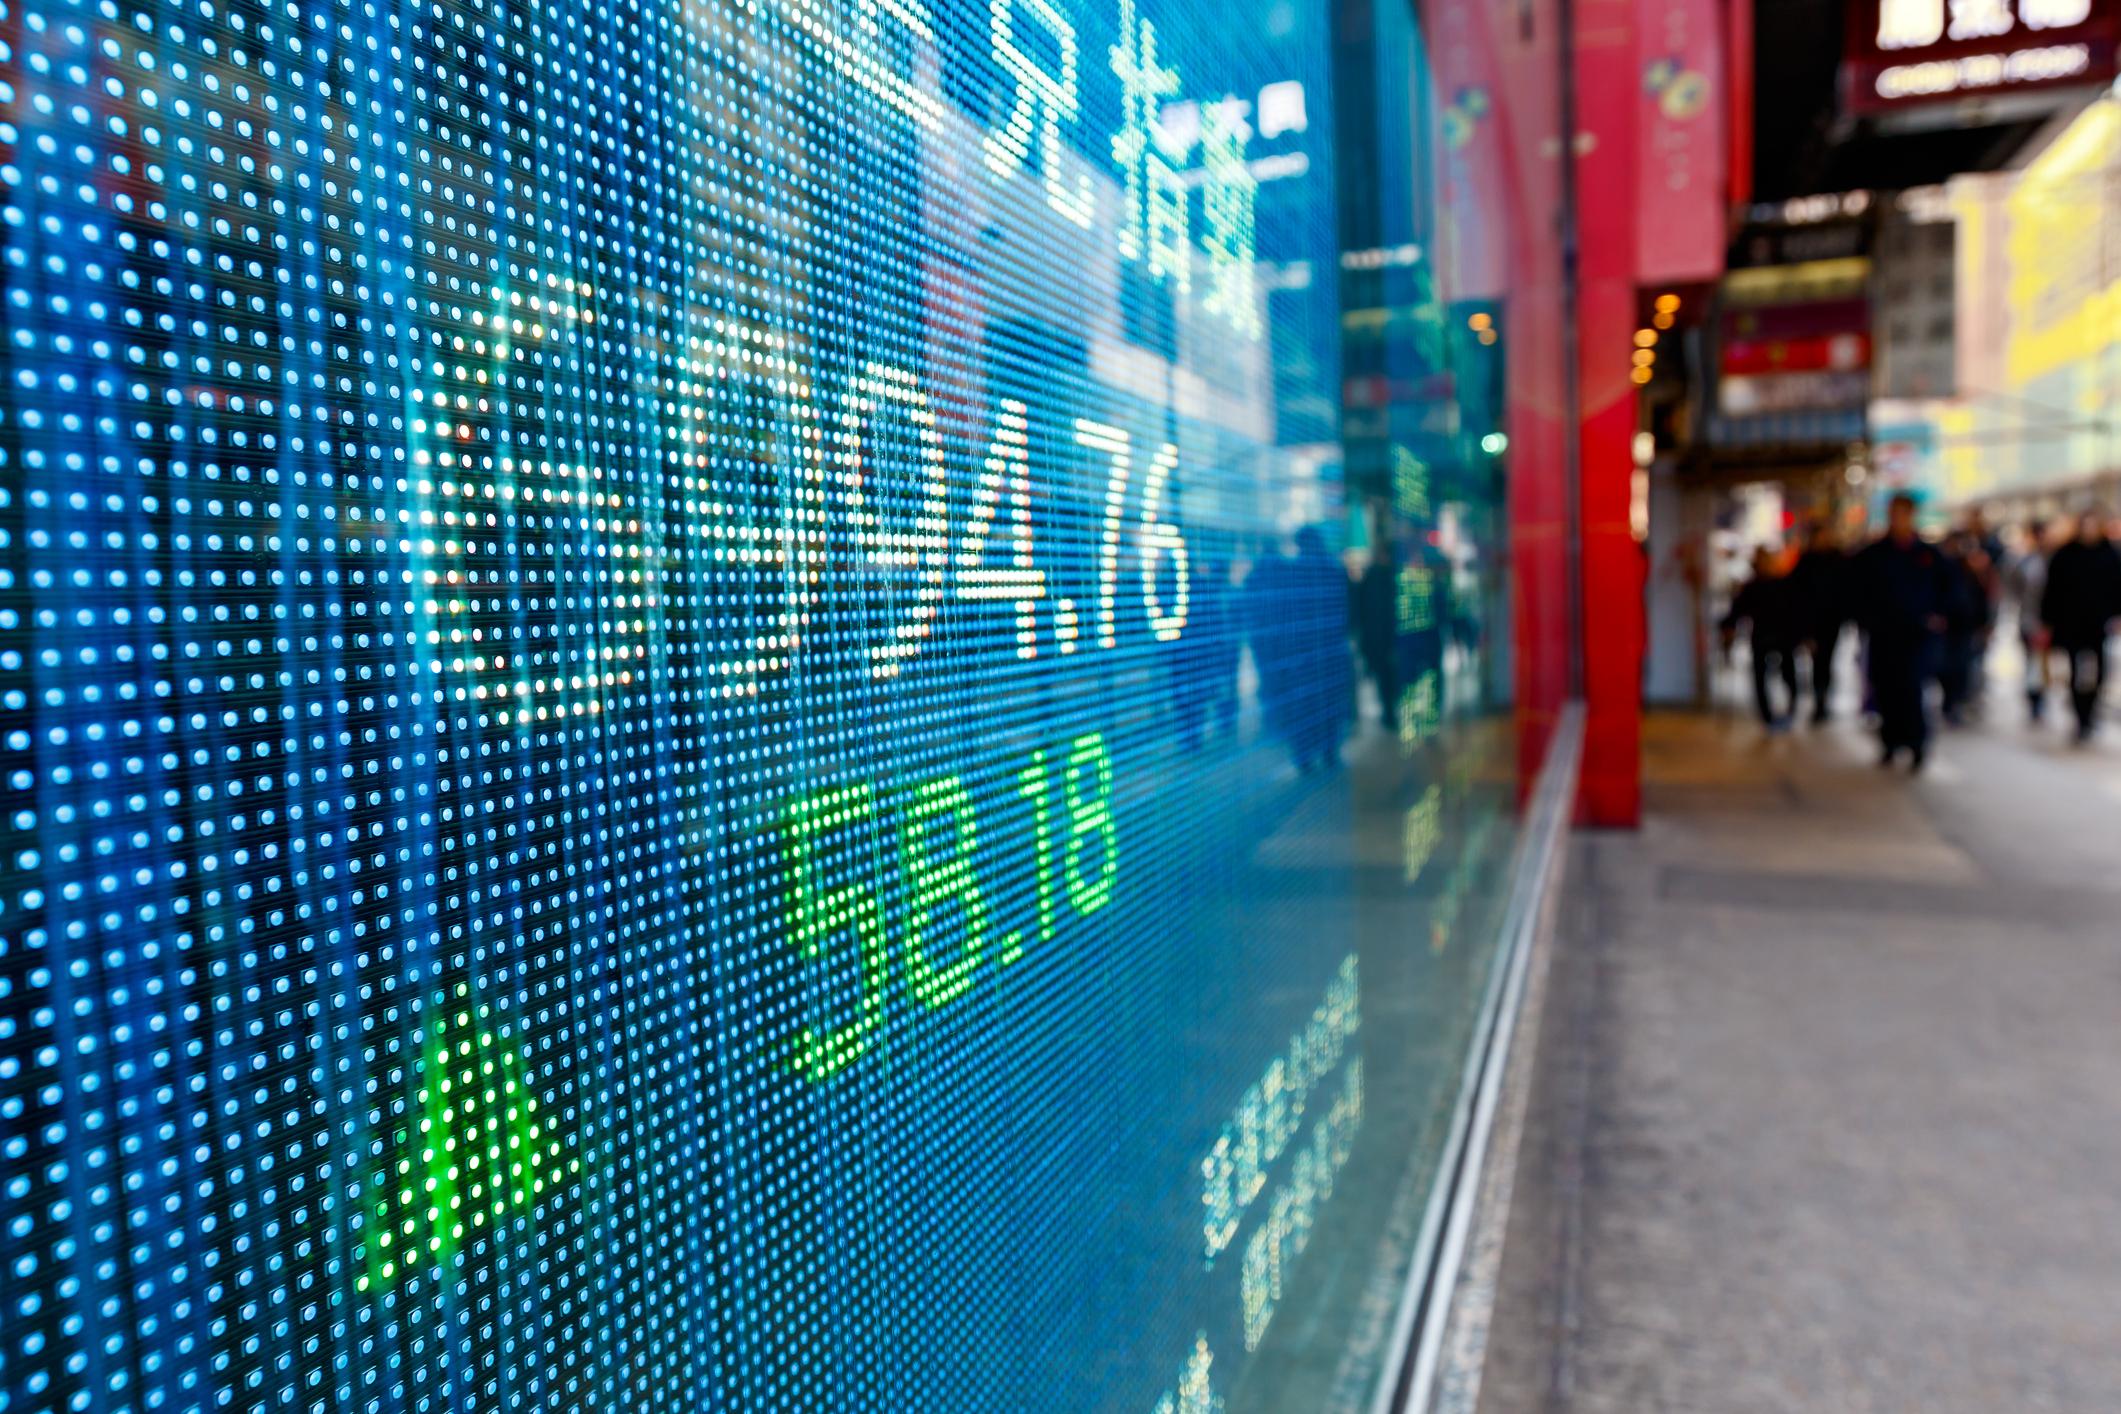 Securities exchange display on street